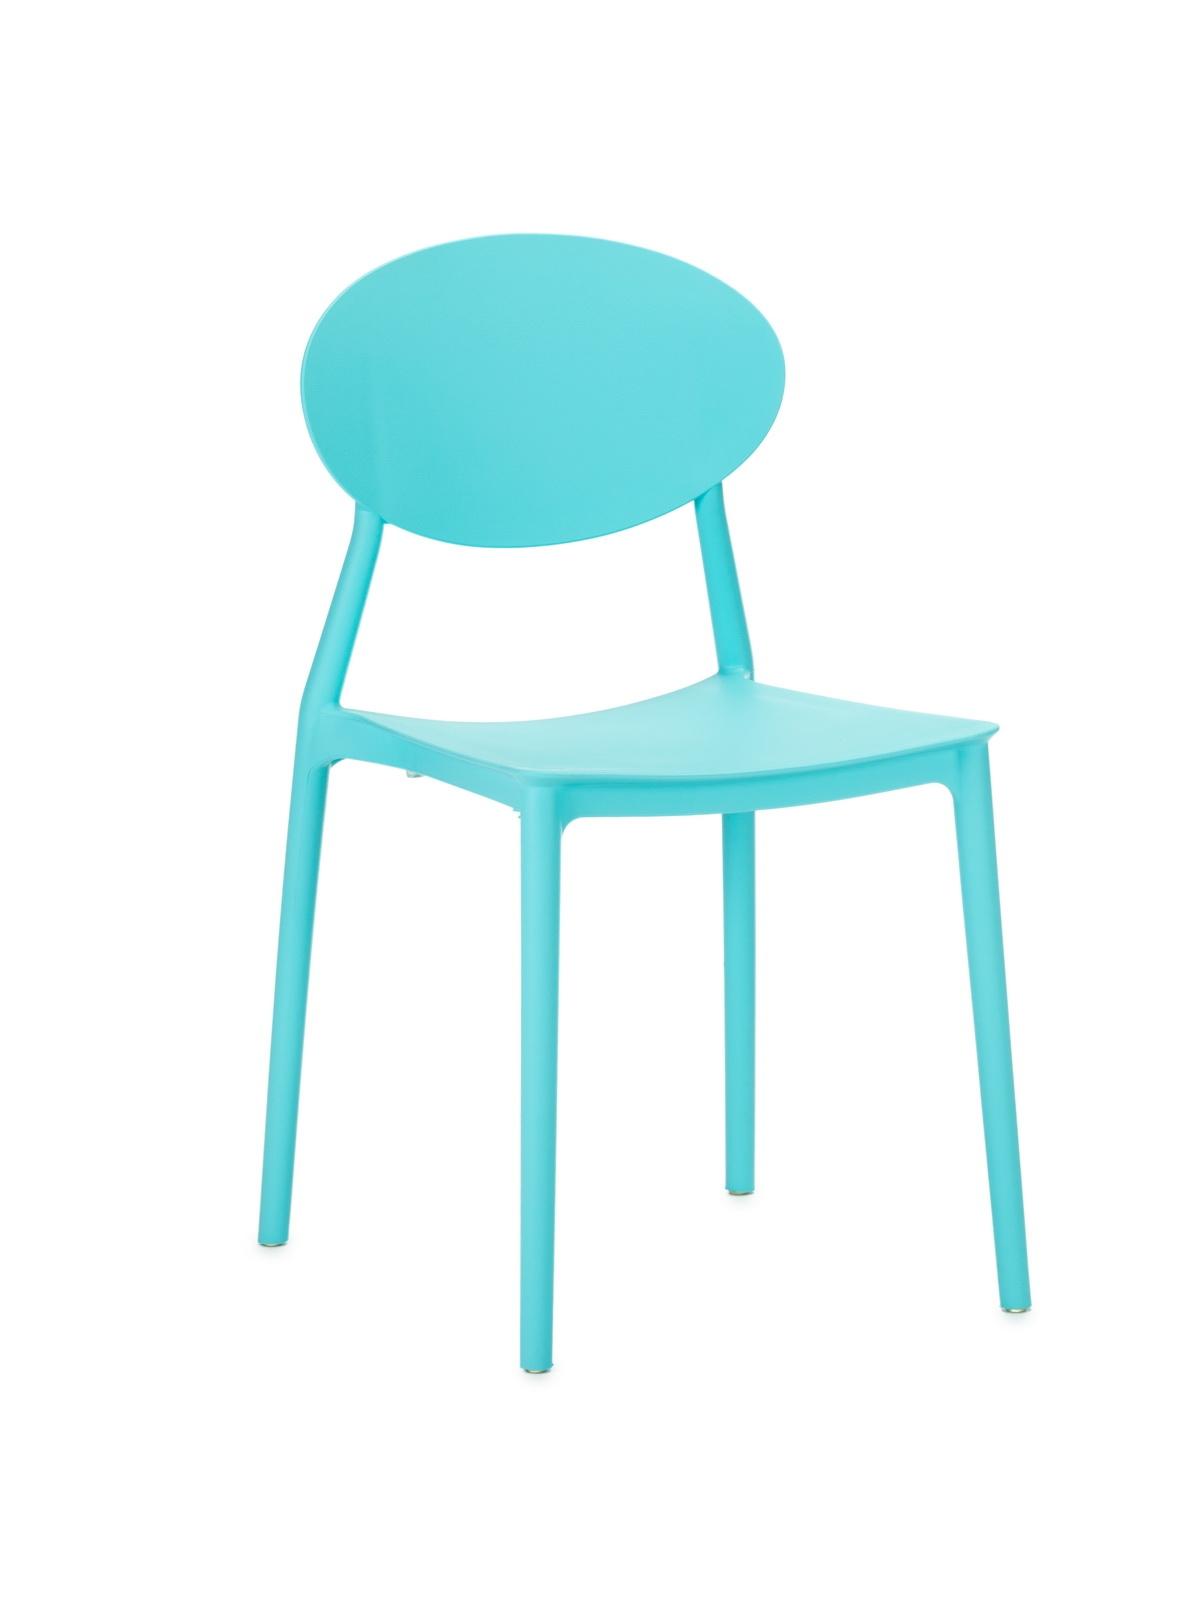 Scaun din plastic, cu picioare din plastic Lolita Blue, l47xA42xH82cm imagine